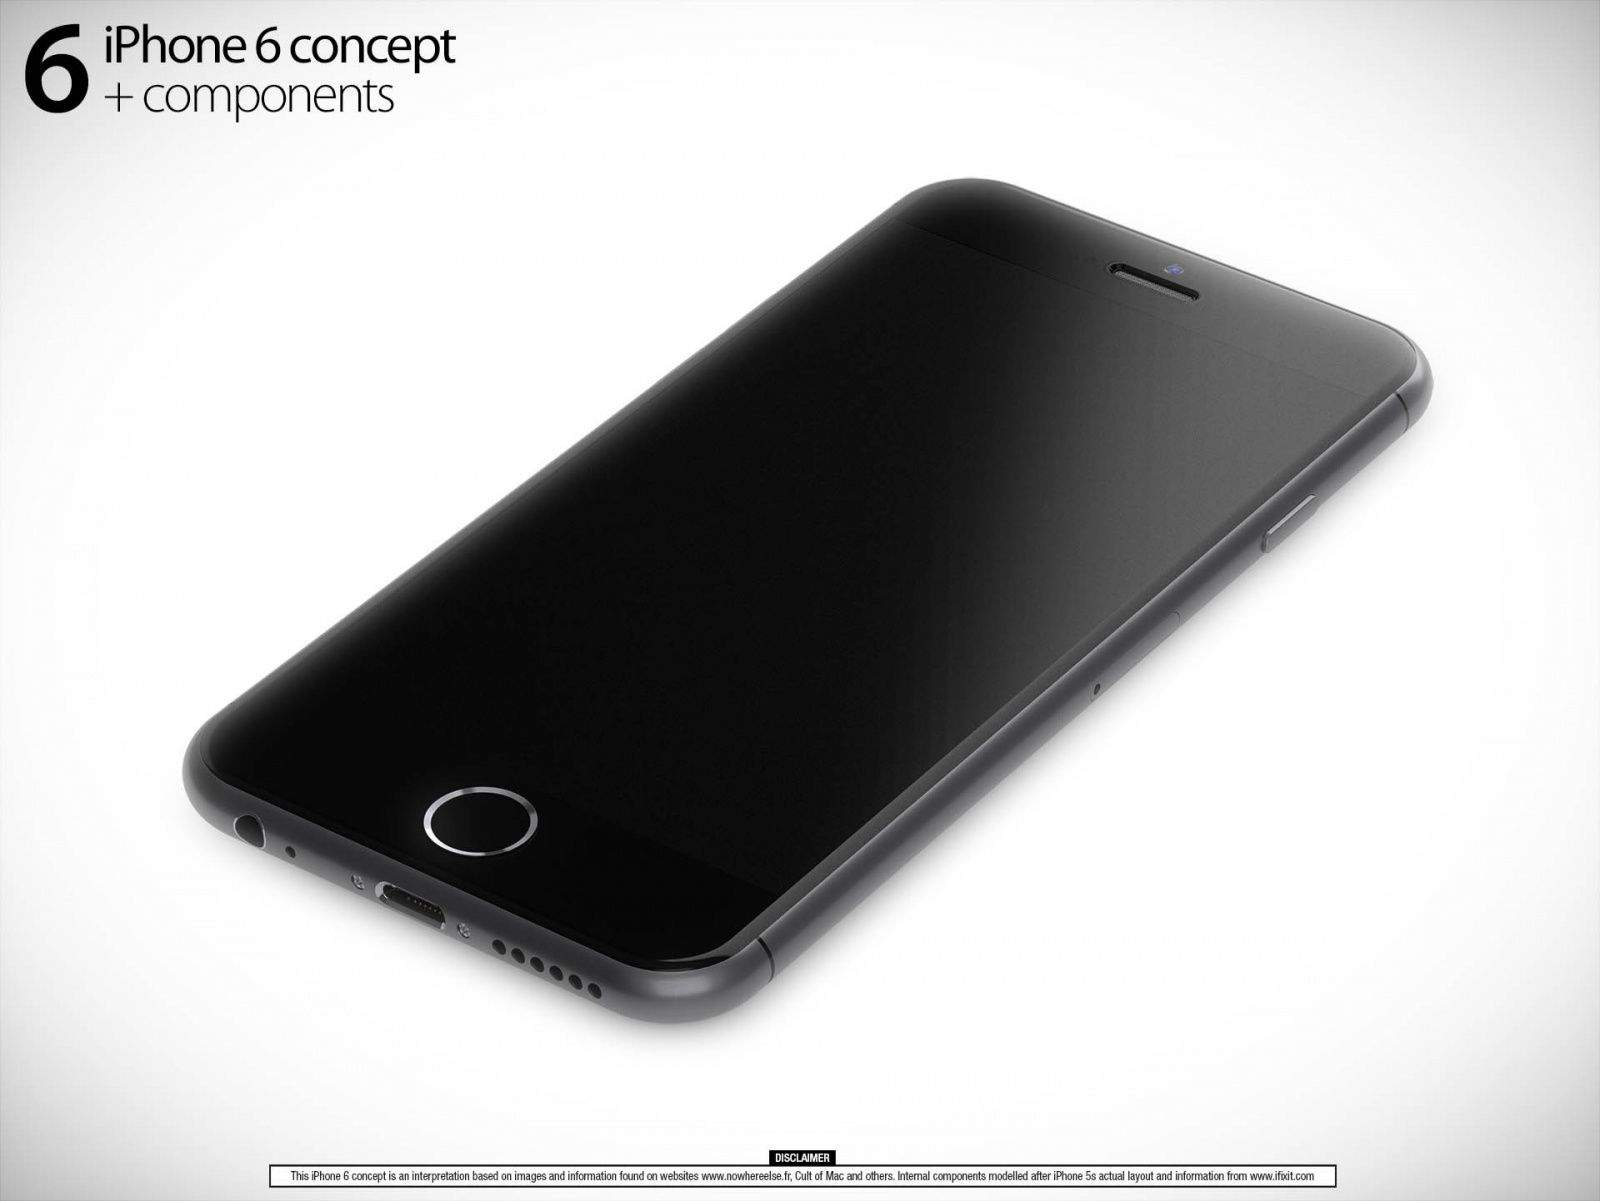 iphone6_martinhajek_11.jpg88dbc37c-00a1-4590-87ac-d96b30be1d3dOriginal